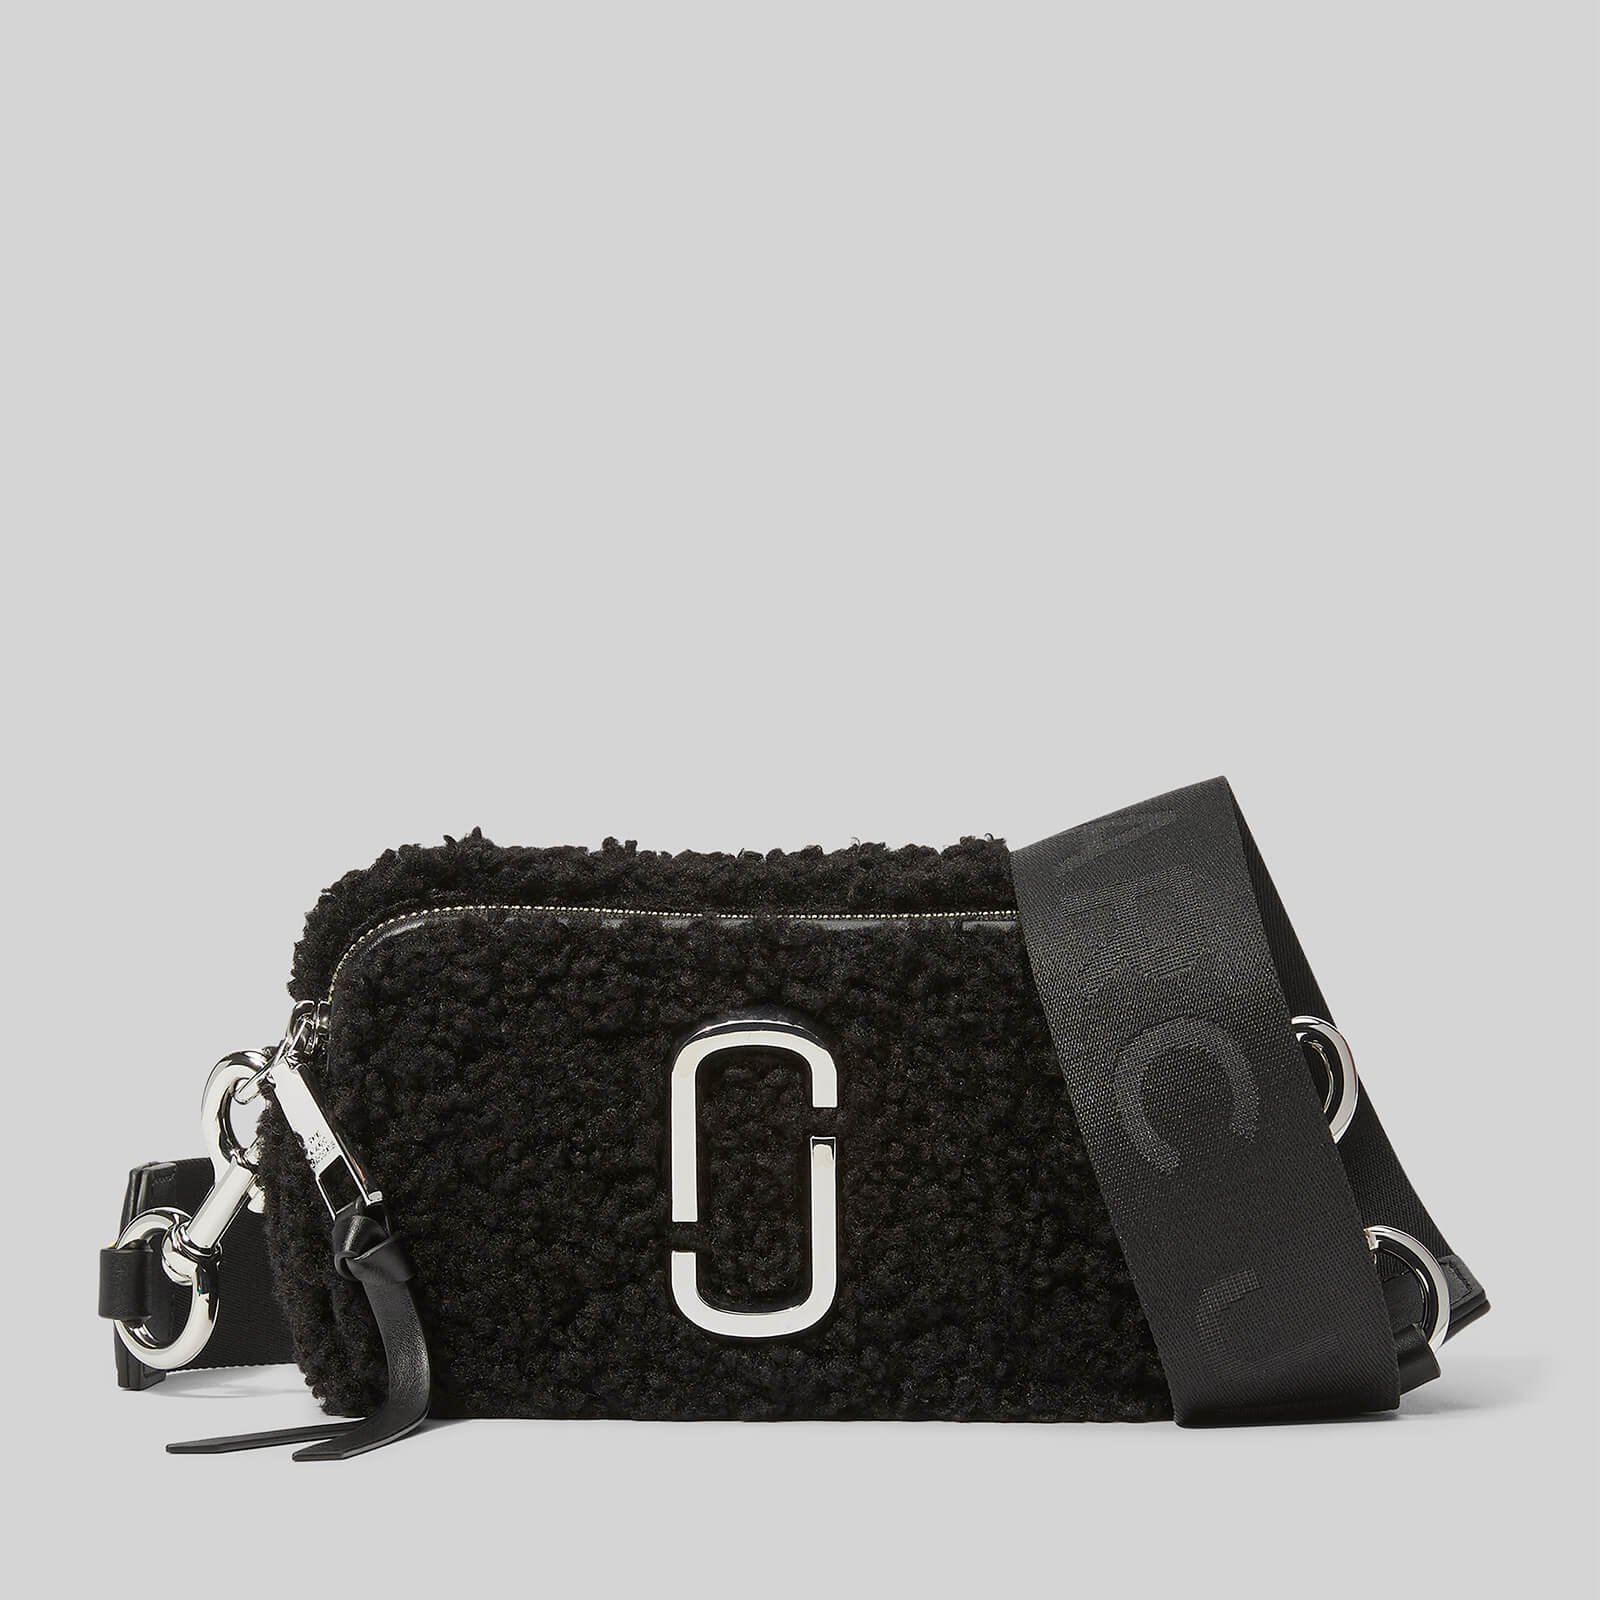 Marc Jacobs Women's Snapshot Teddy Bag - Black